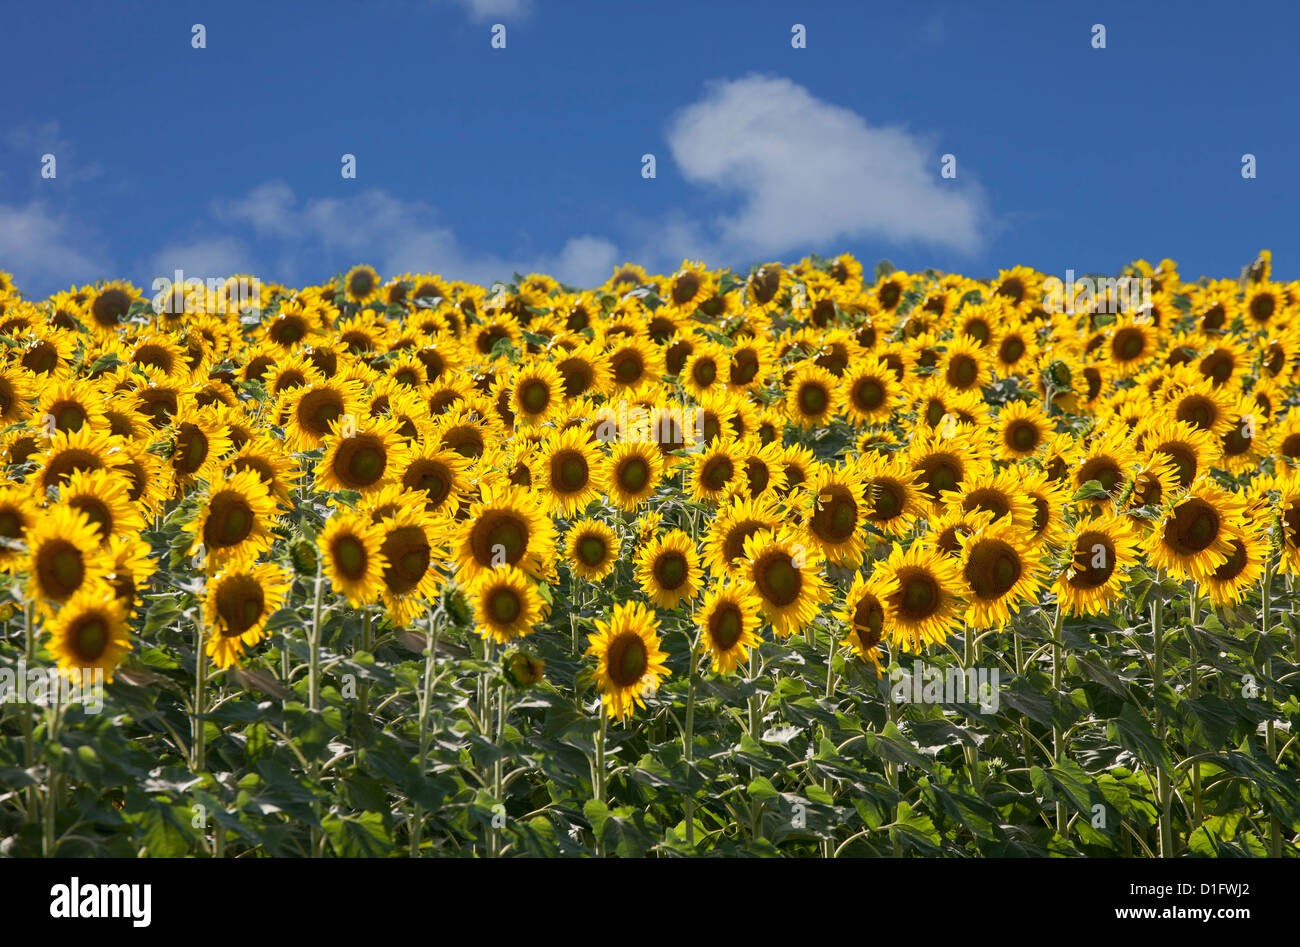 Sunflowers in Tuscany, Italy, Europe - Stock Image